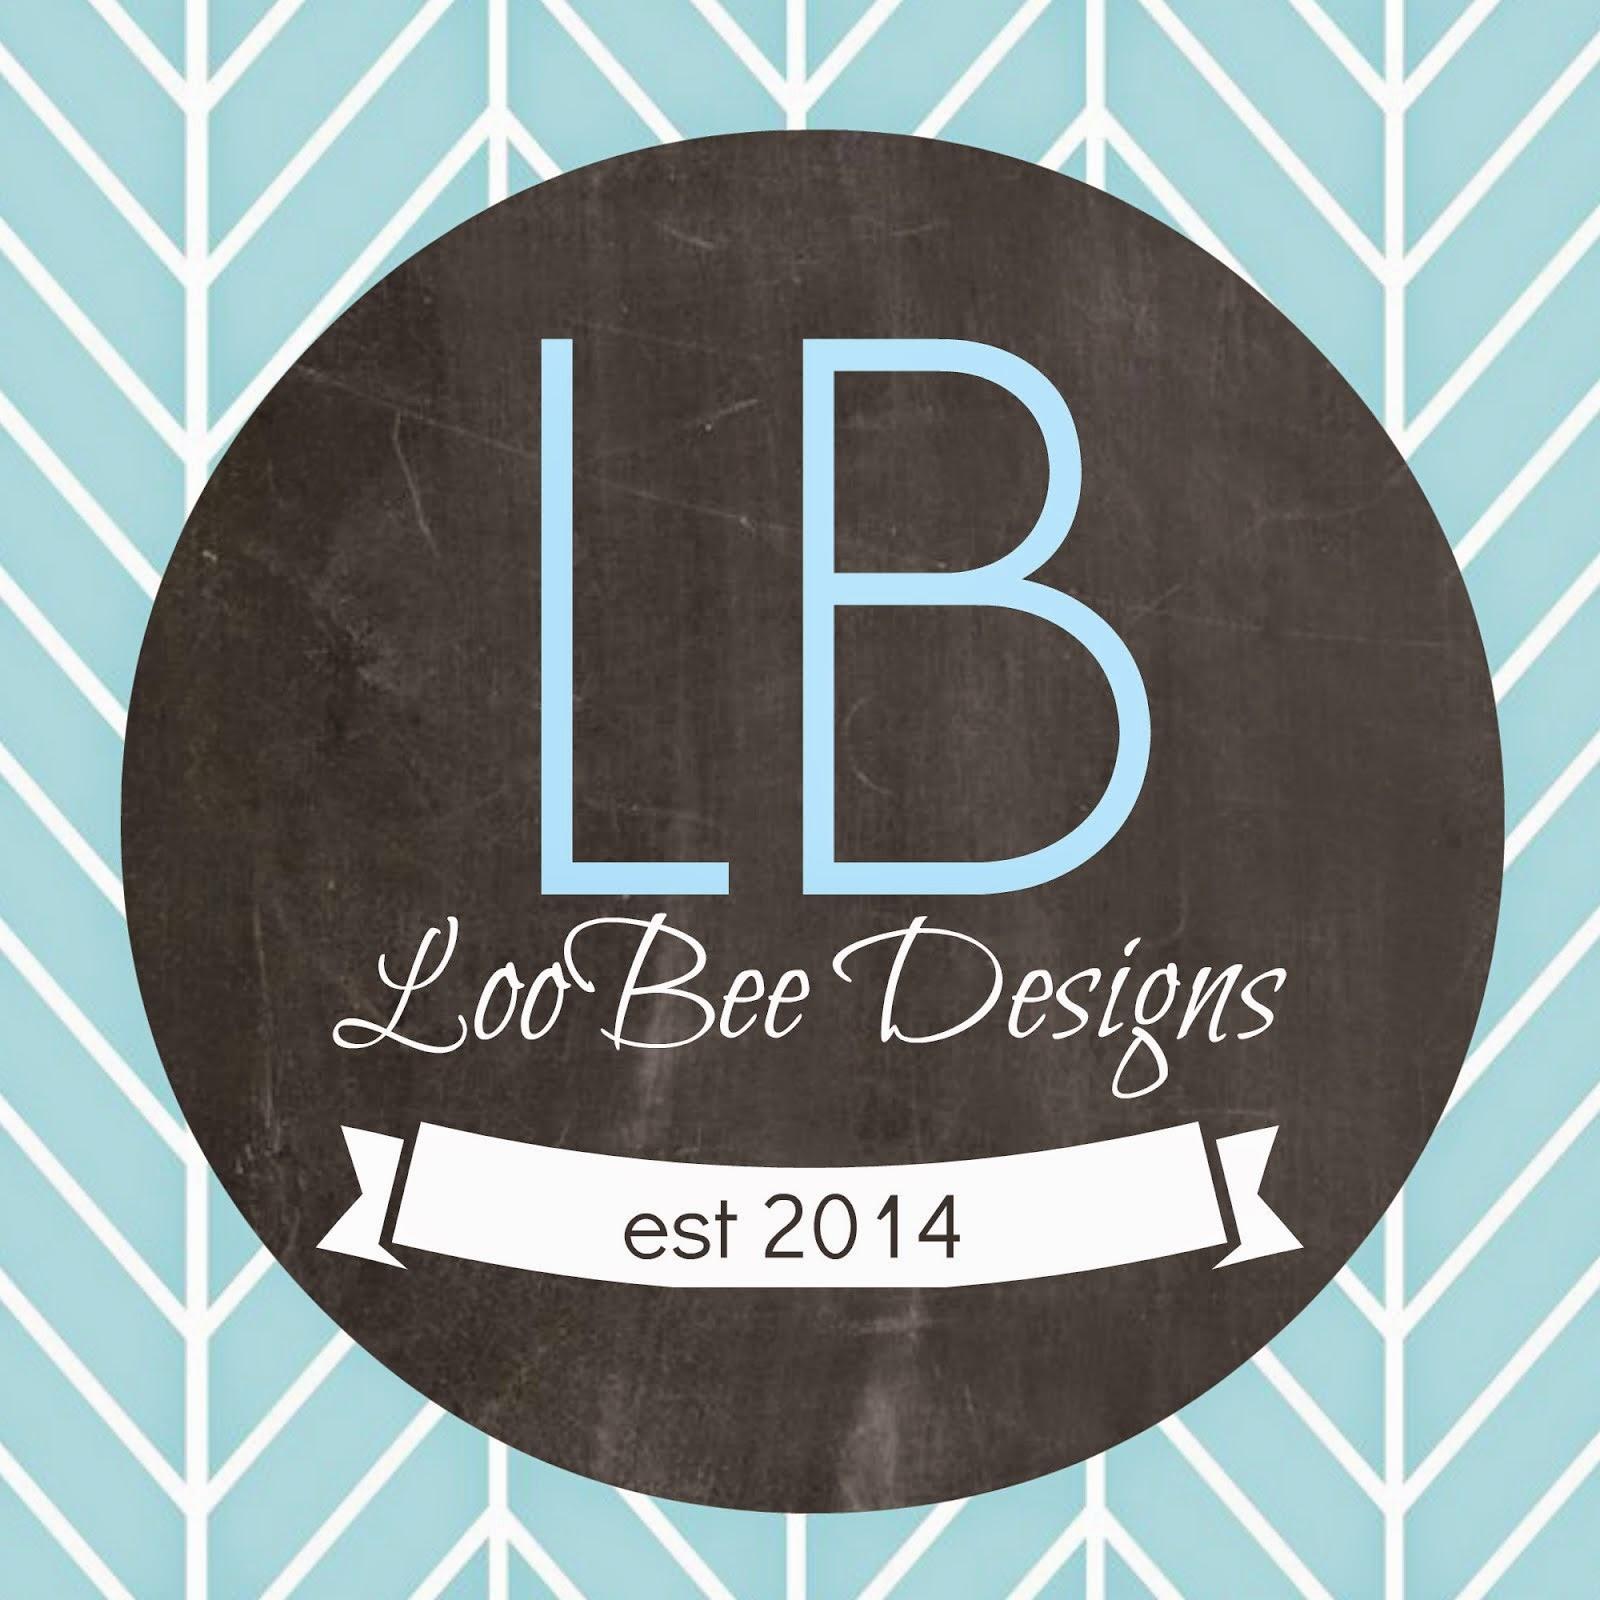 LooBee Designs